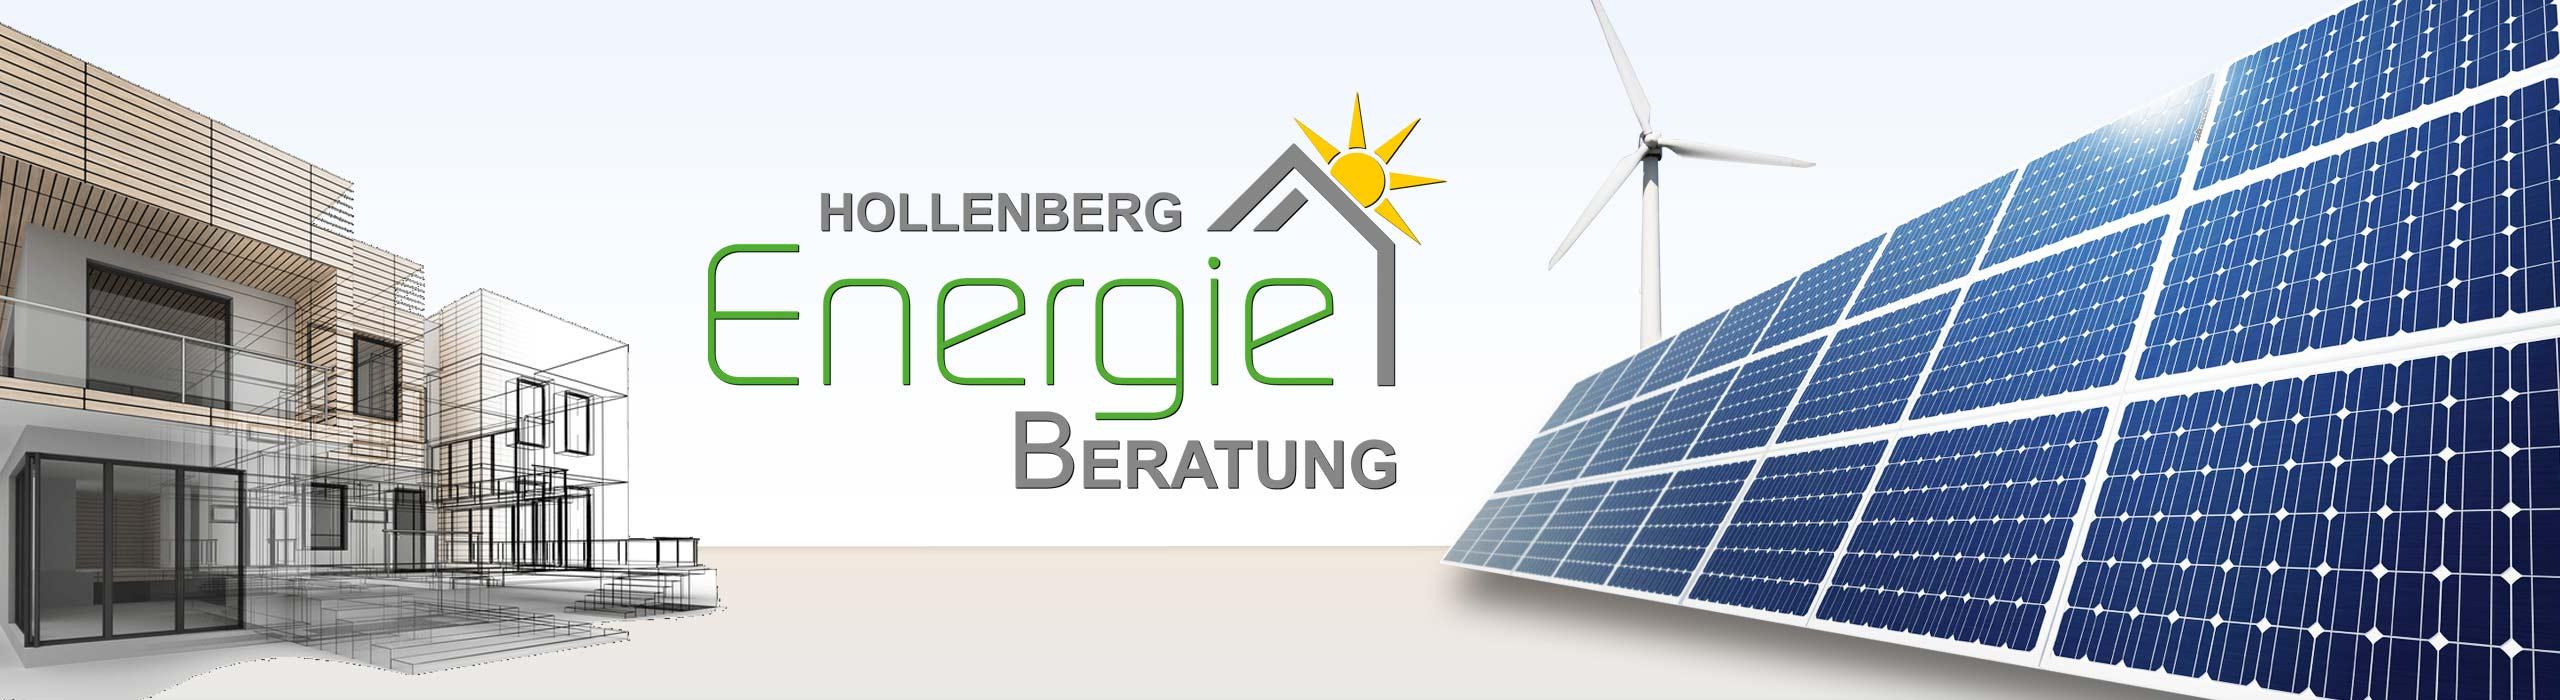 Energieberatung Hollenberg